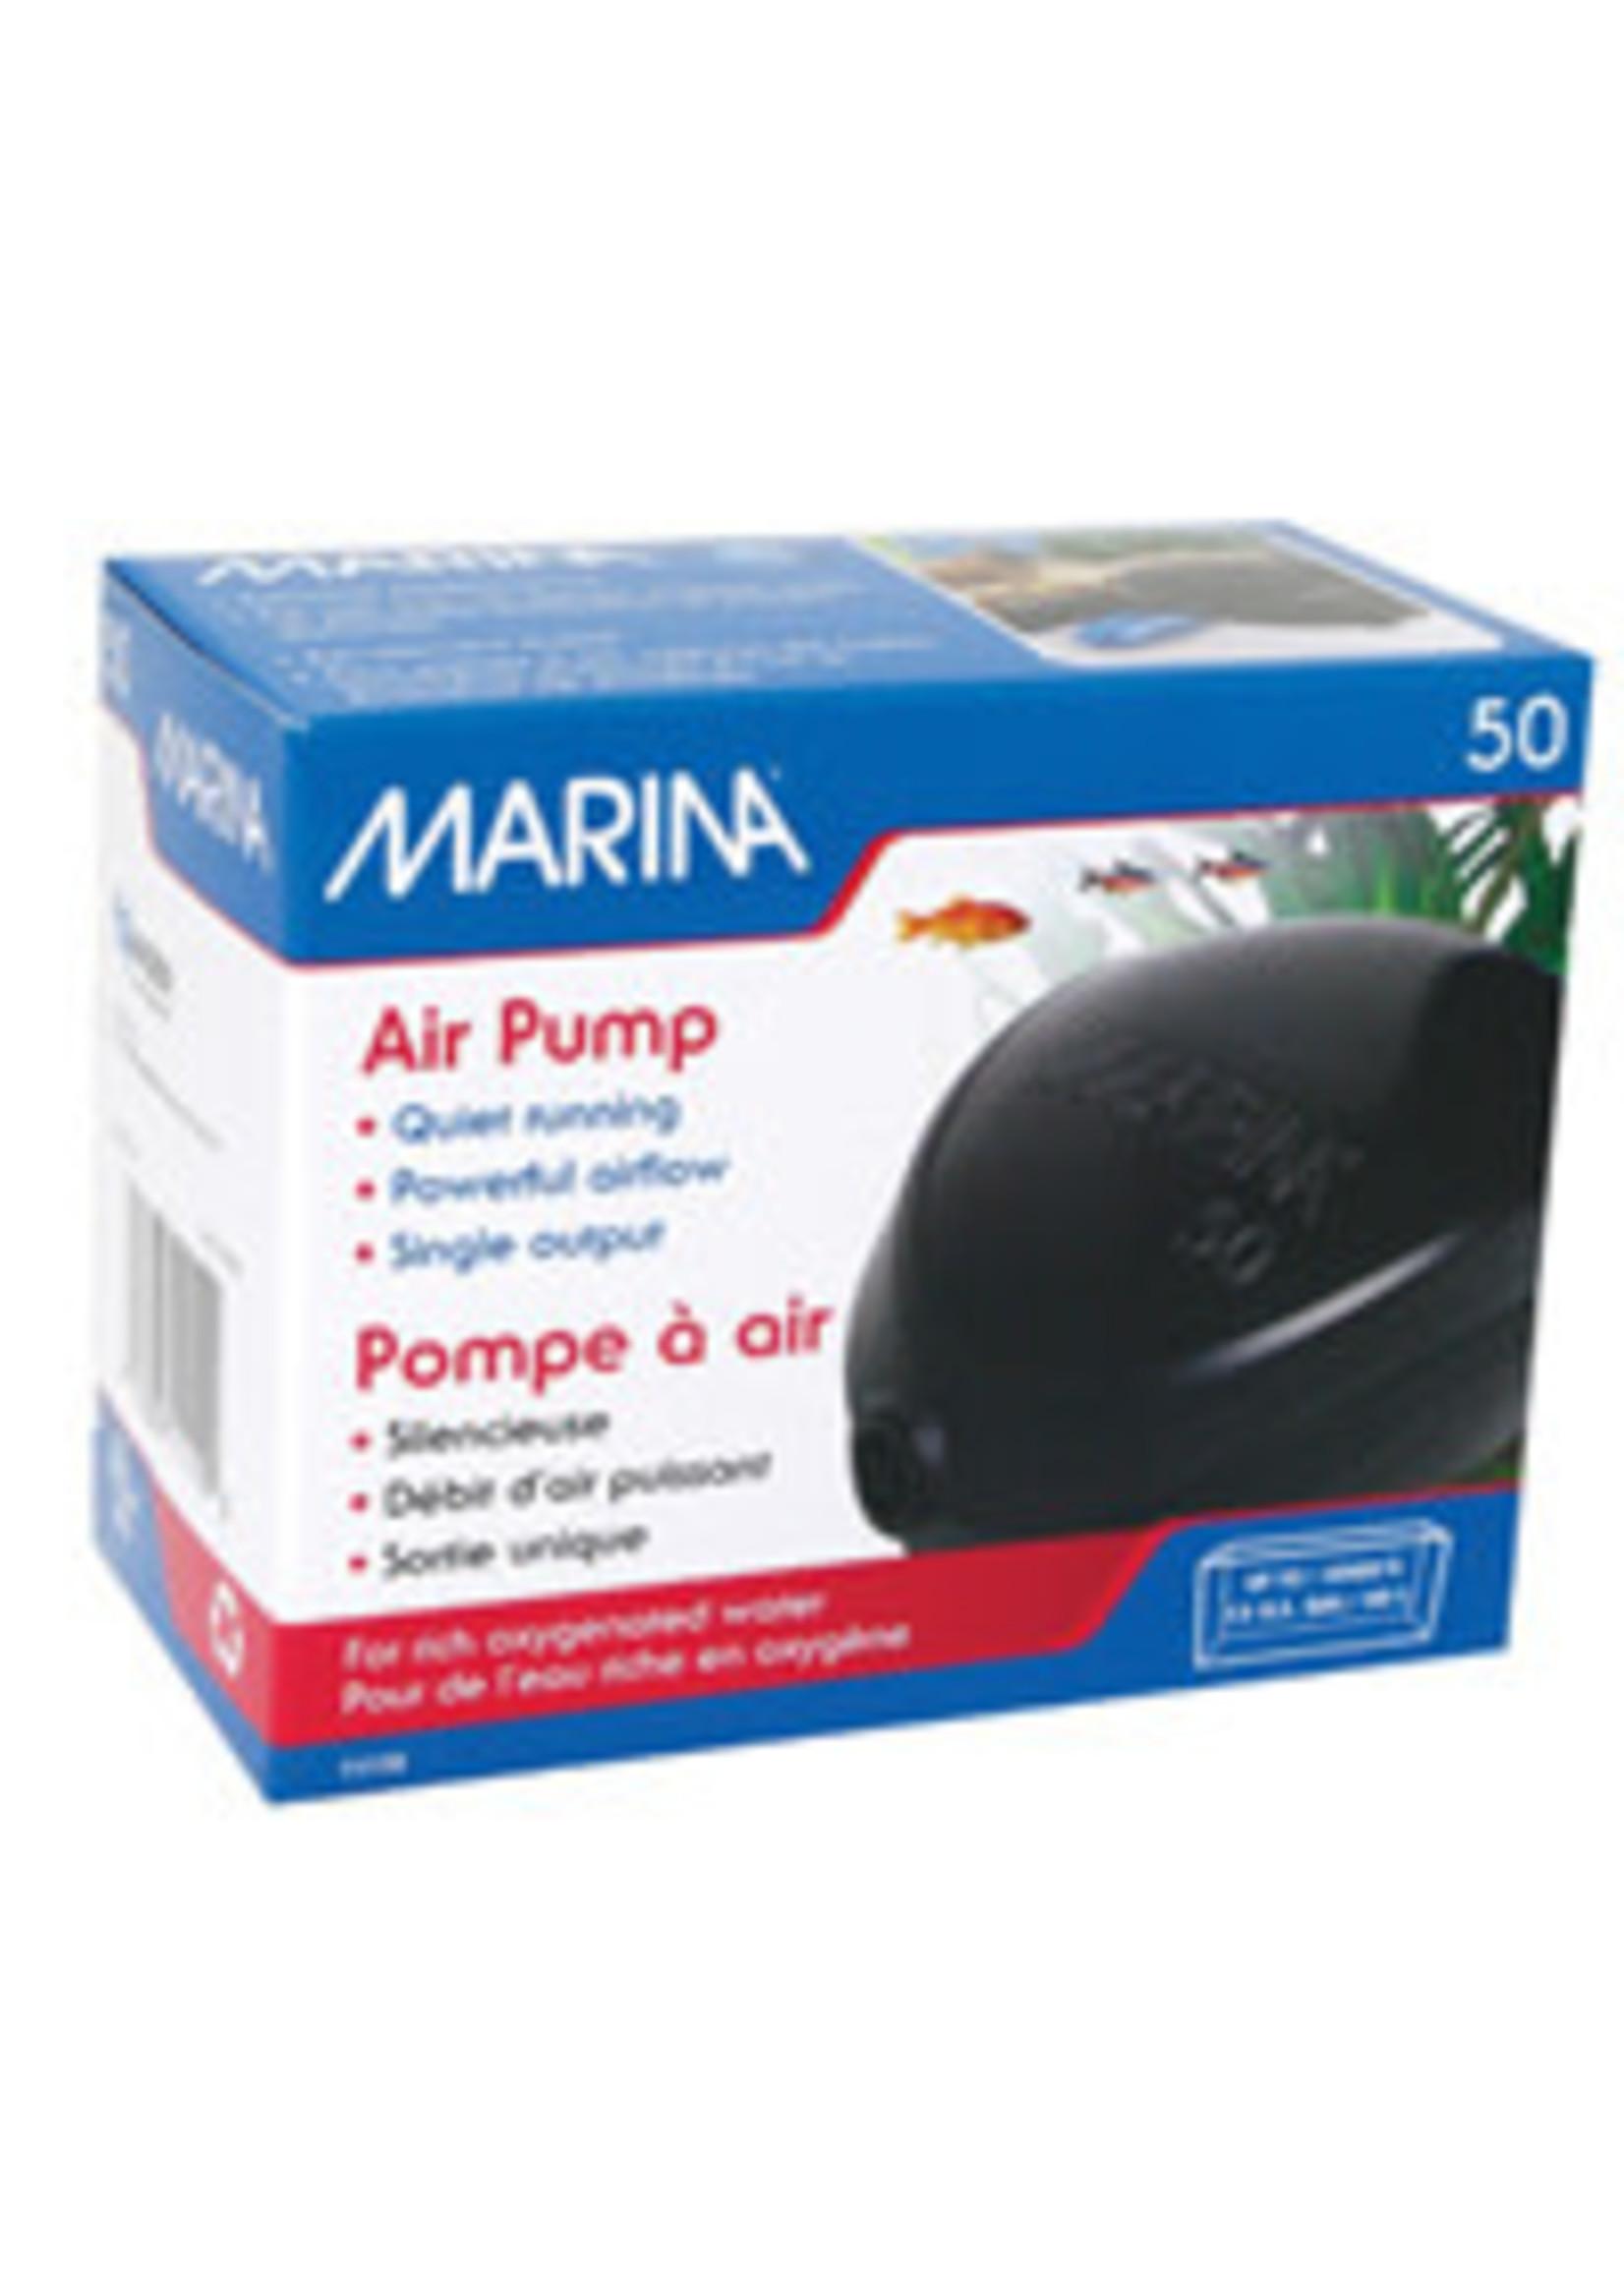 Marina Marina 50 Air Pump